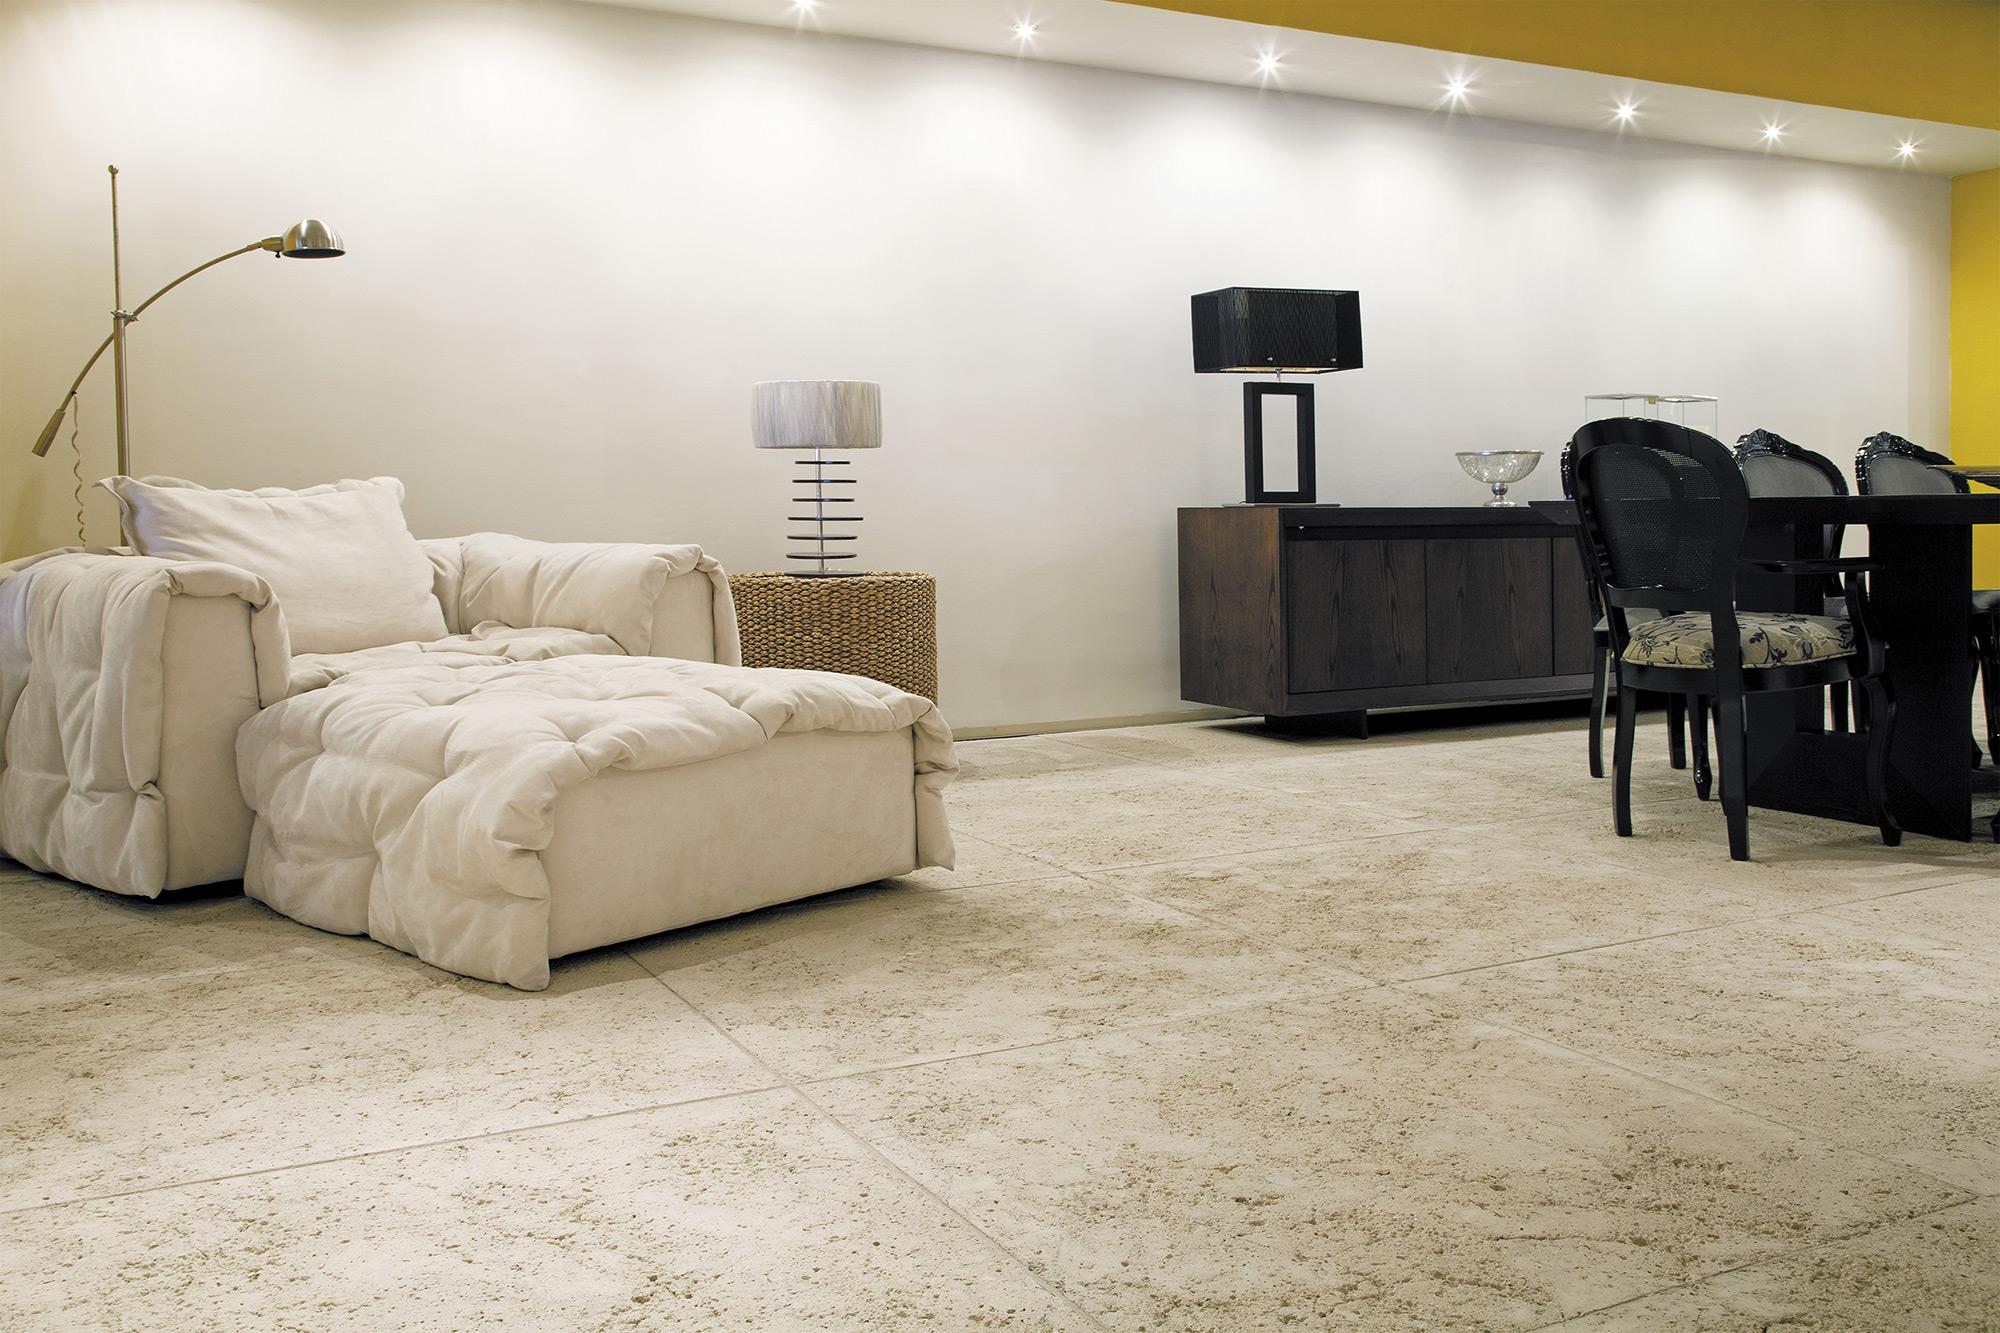 Etrusco Areia - Designer de Interiores Roseane Sanches e Sidnei Pereira